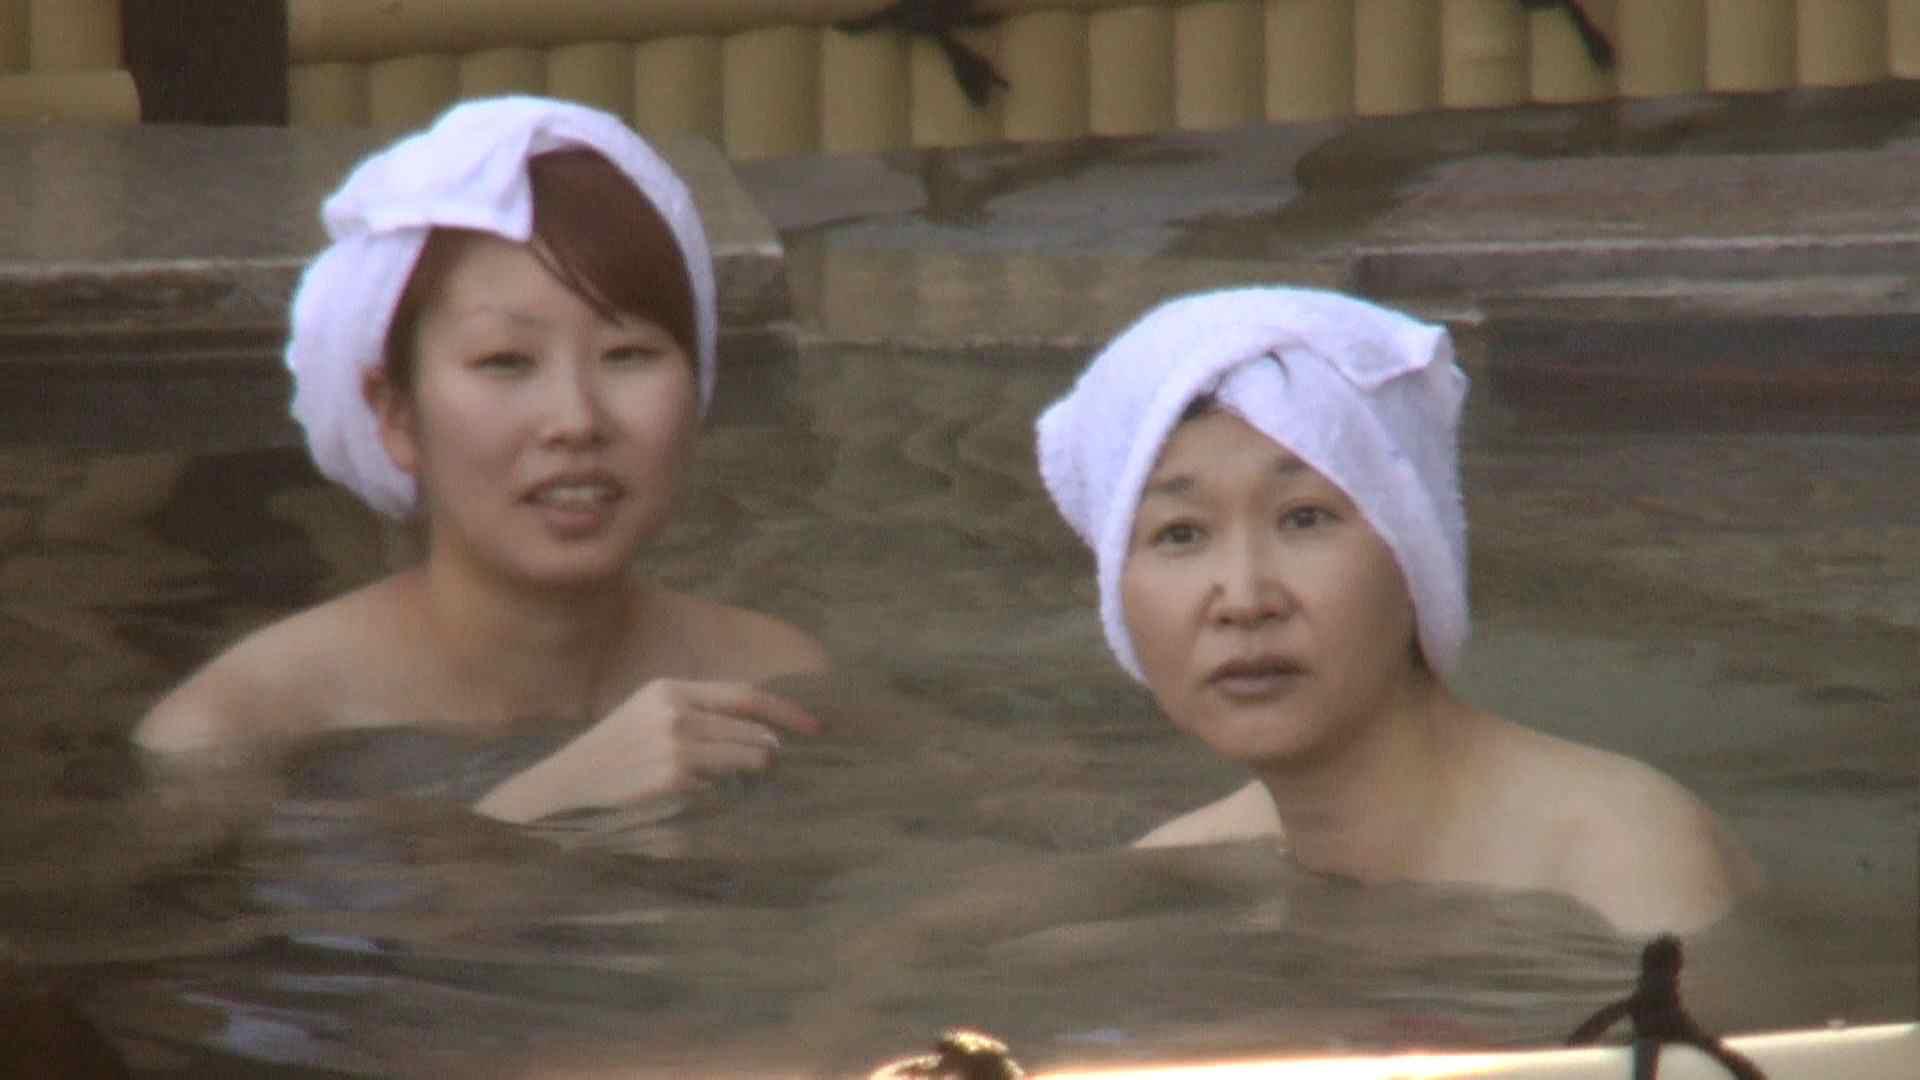 Aquaな露天風呂Vol.210 OL女体  49連発 21